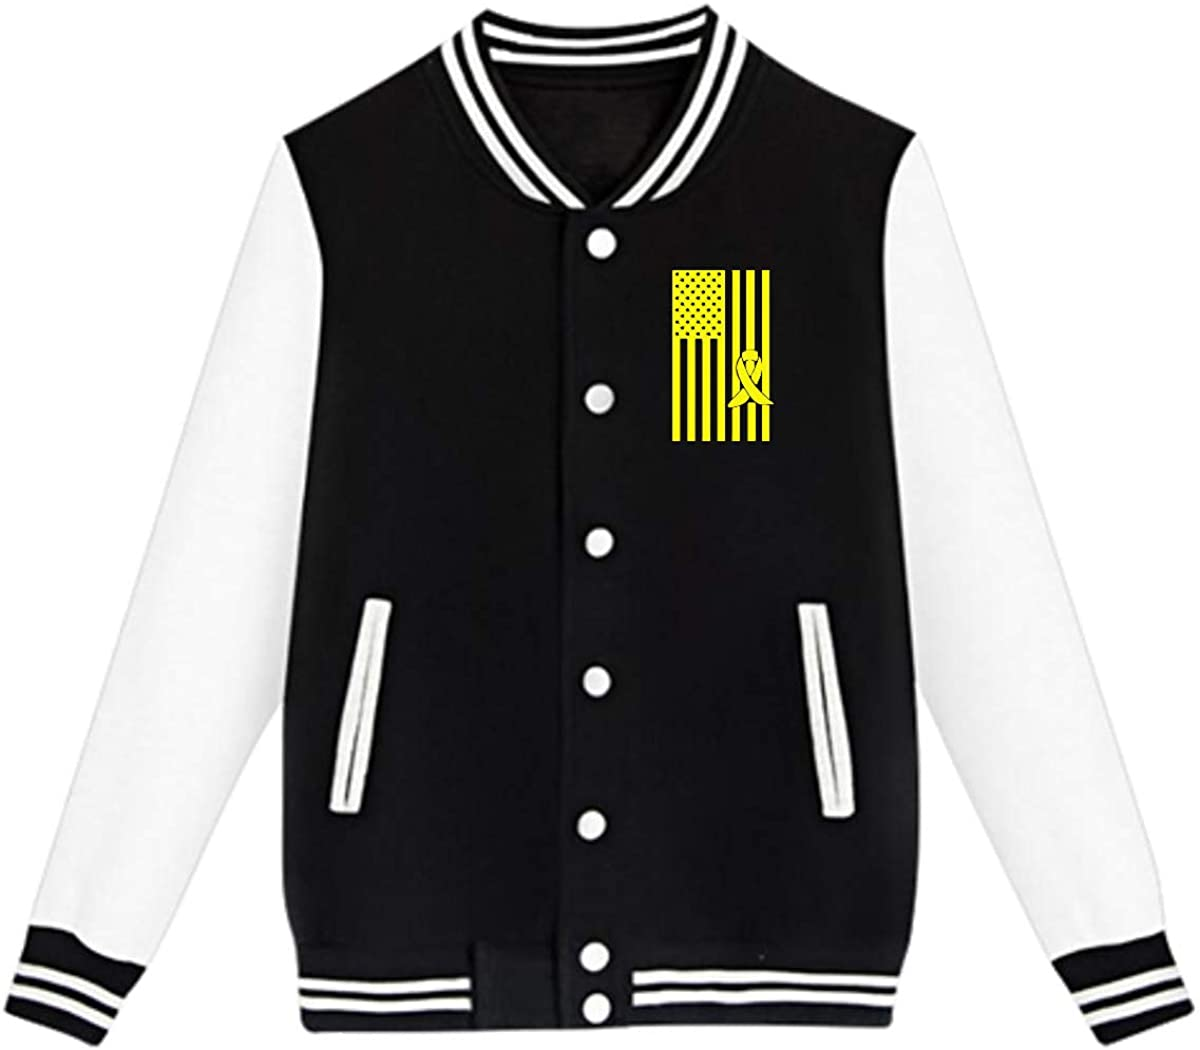 Back Print NJKM5MJ Unisex Youth Baseball Uniform Jacket Sarcoma Bone Cancer Awareness American Flag Coat Sport Outfit